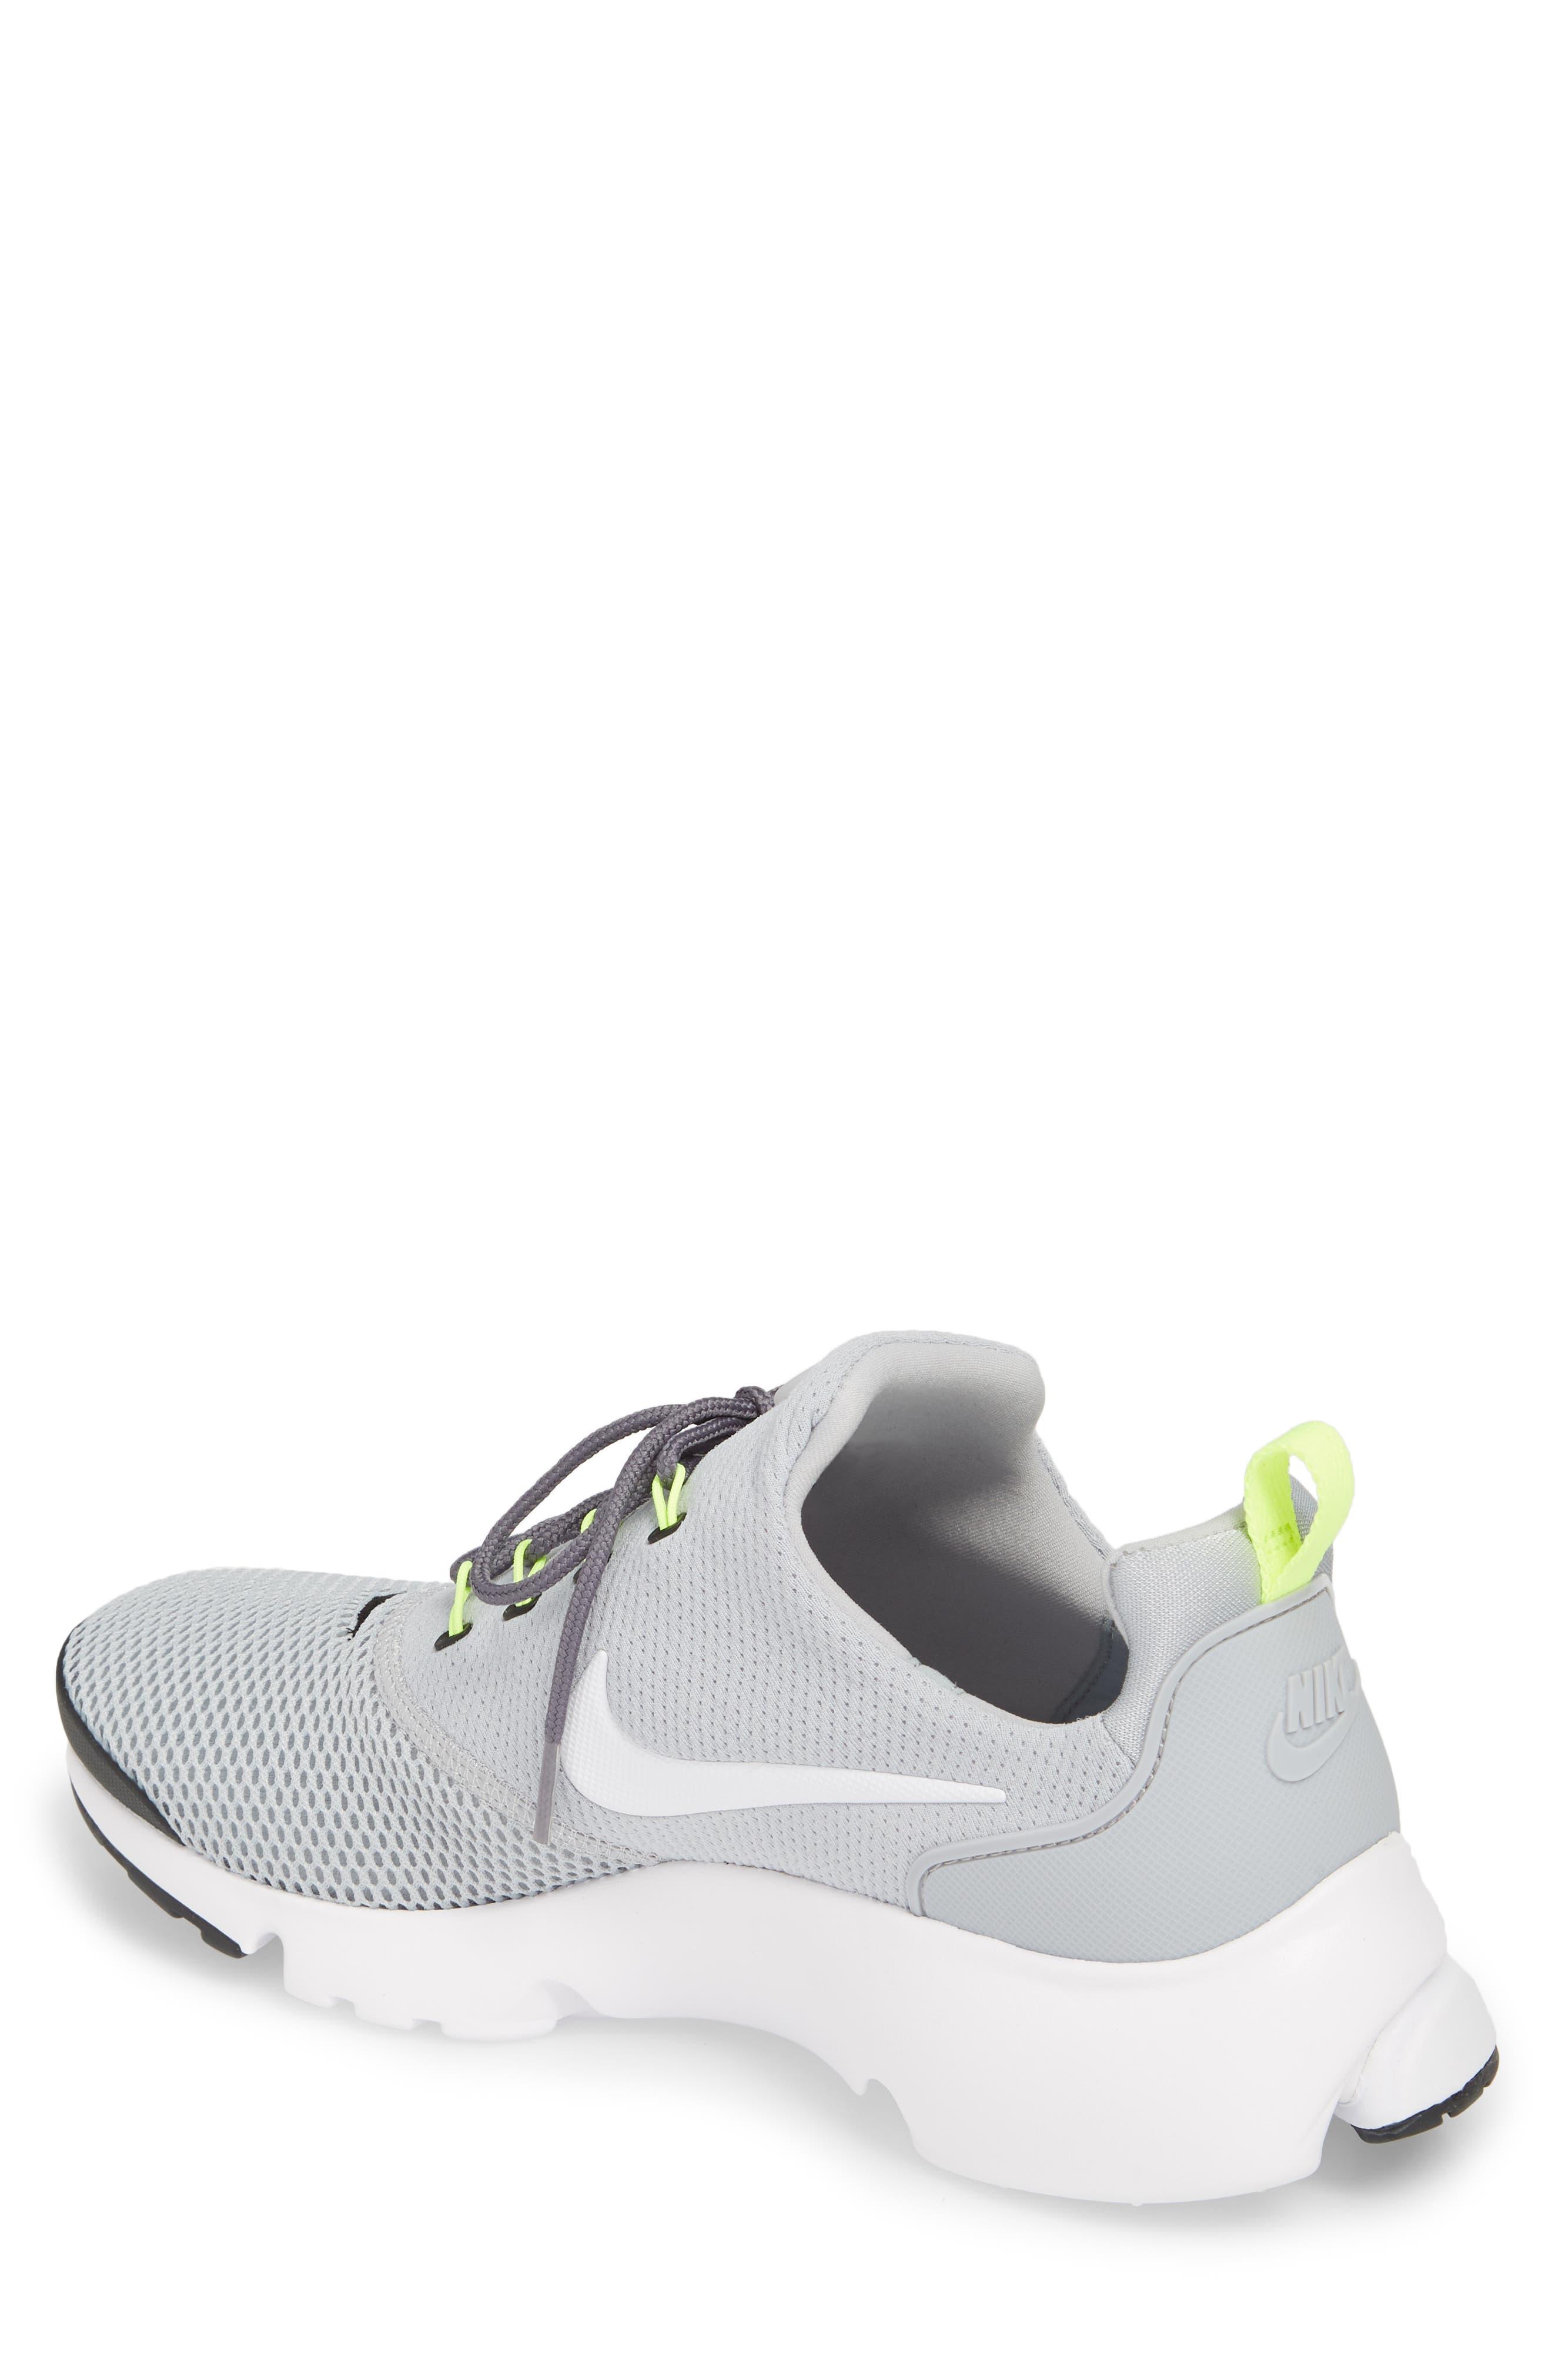 Presto Fly Sneaker,                             Alternate thumbnail 2, color,                             023